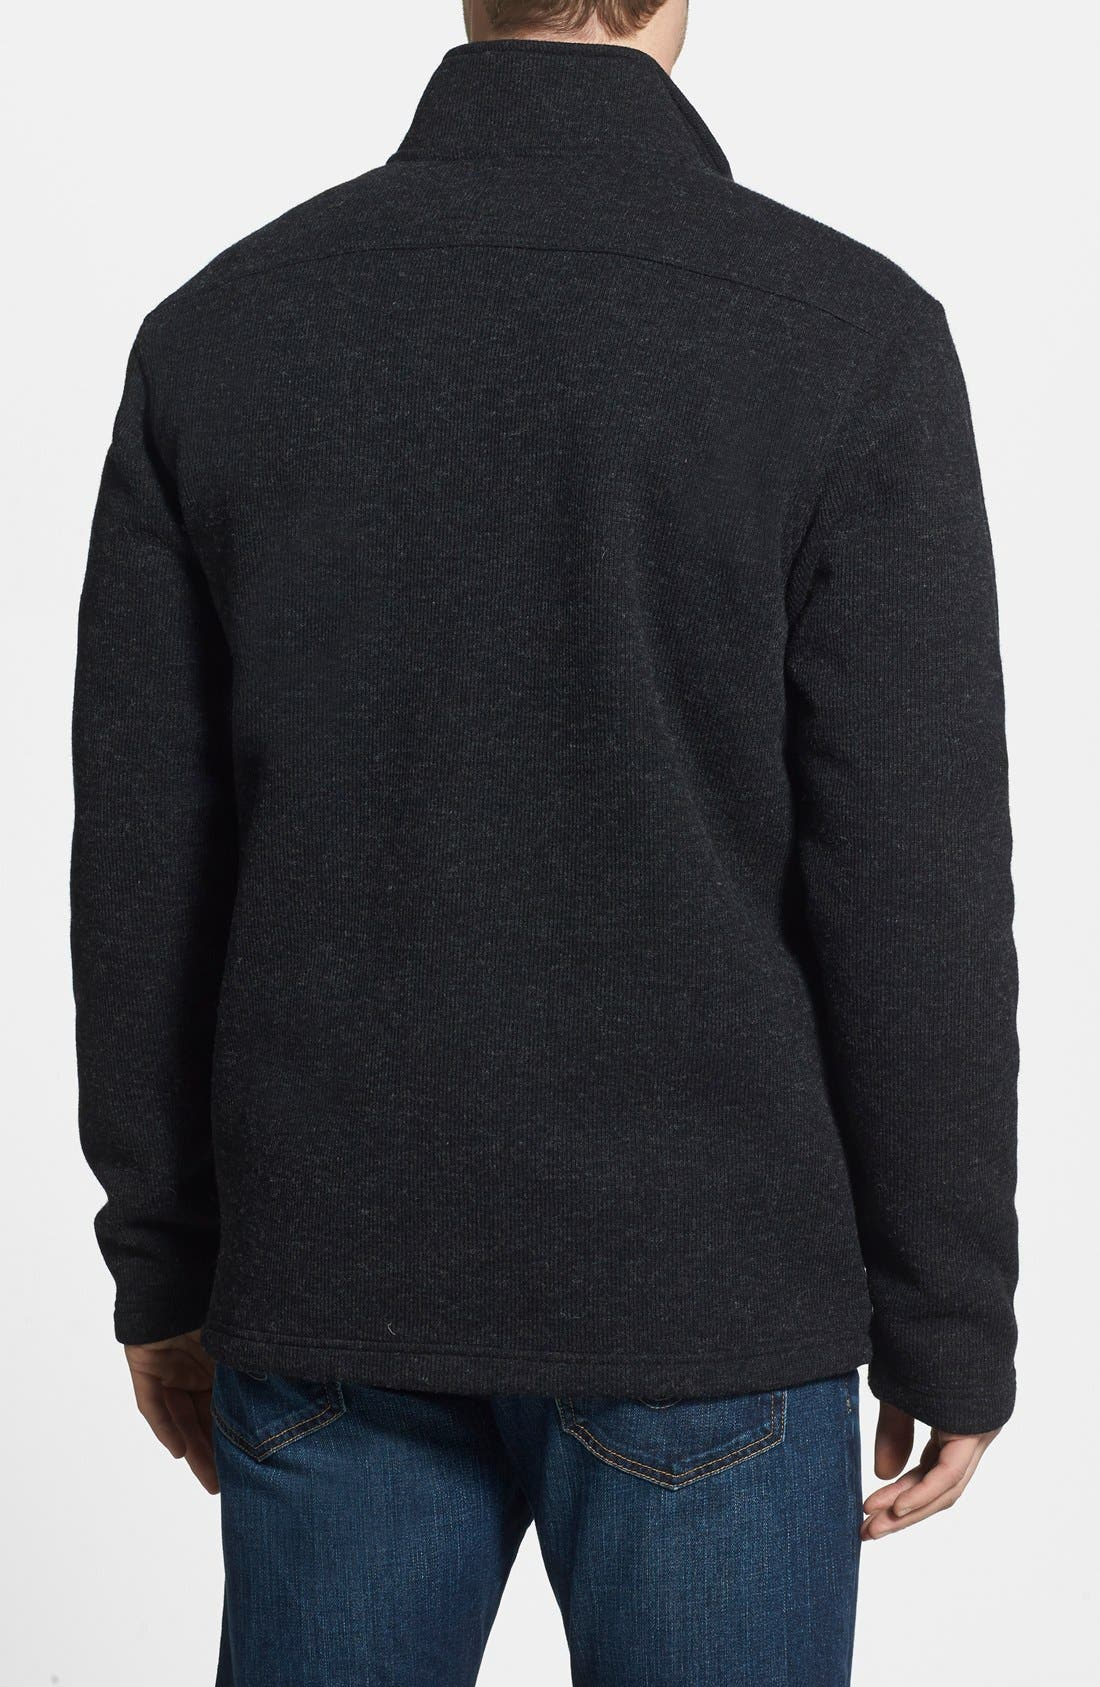 Alternate Image 2  - Merrell 'Big Sky' Fleece Knit Jacket (Online Only)